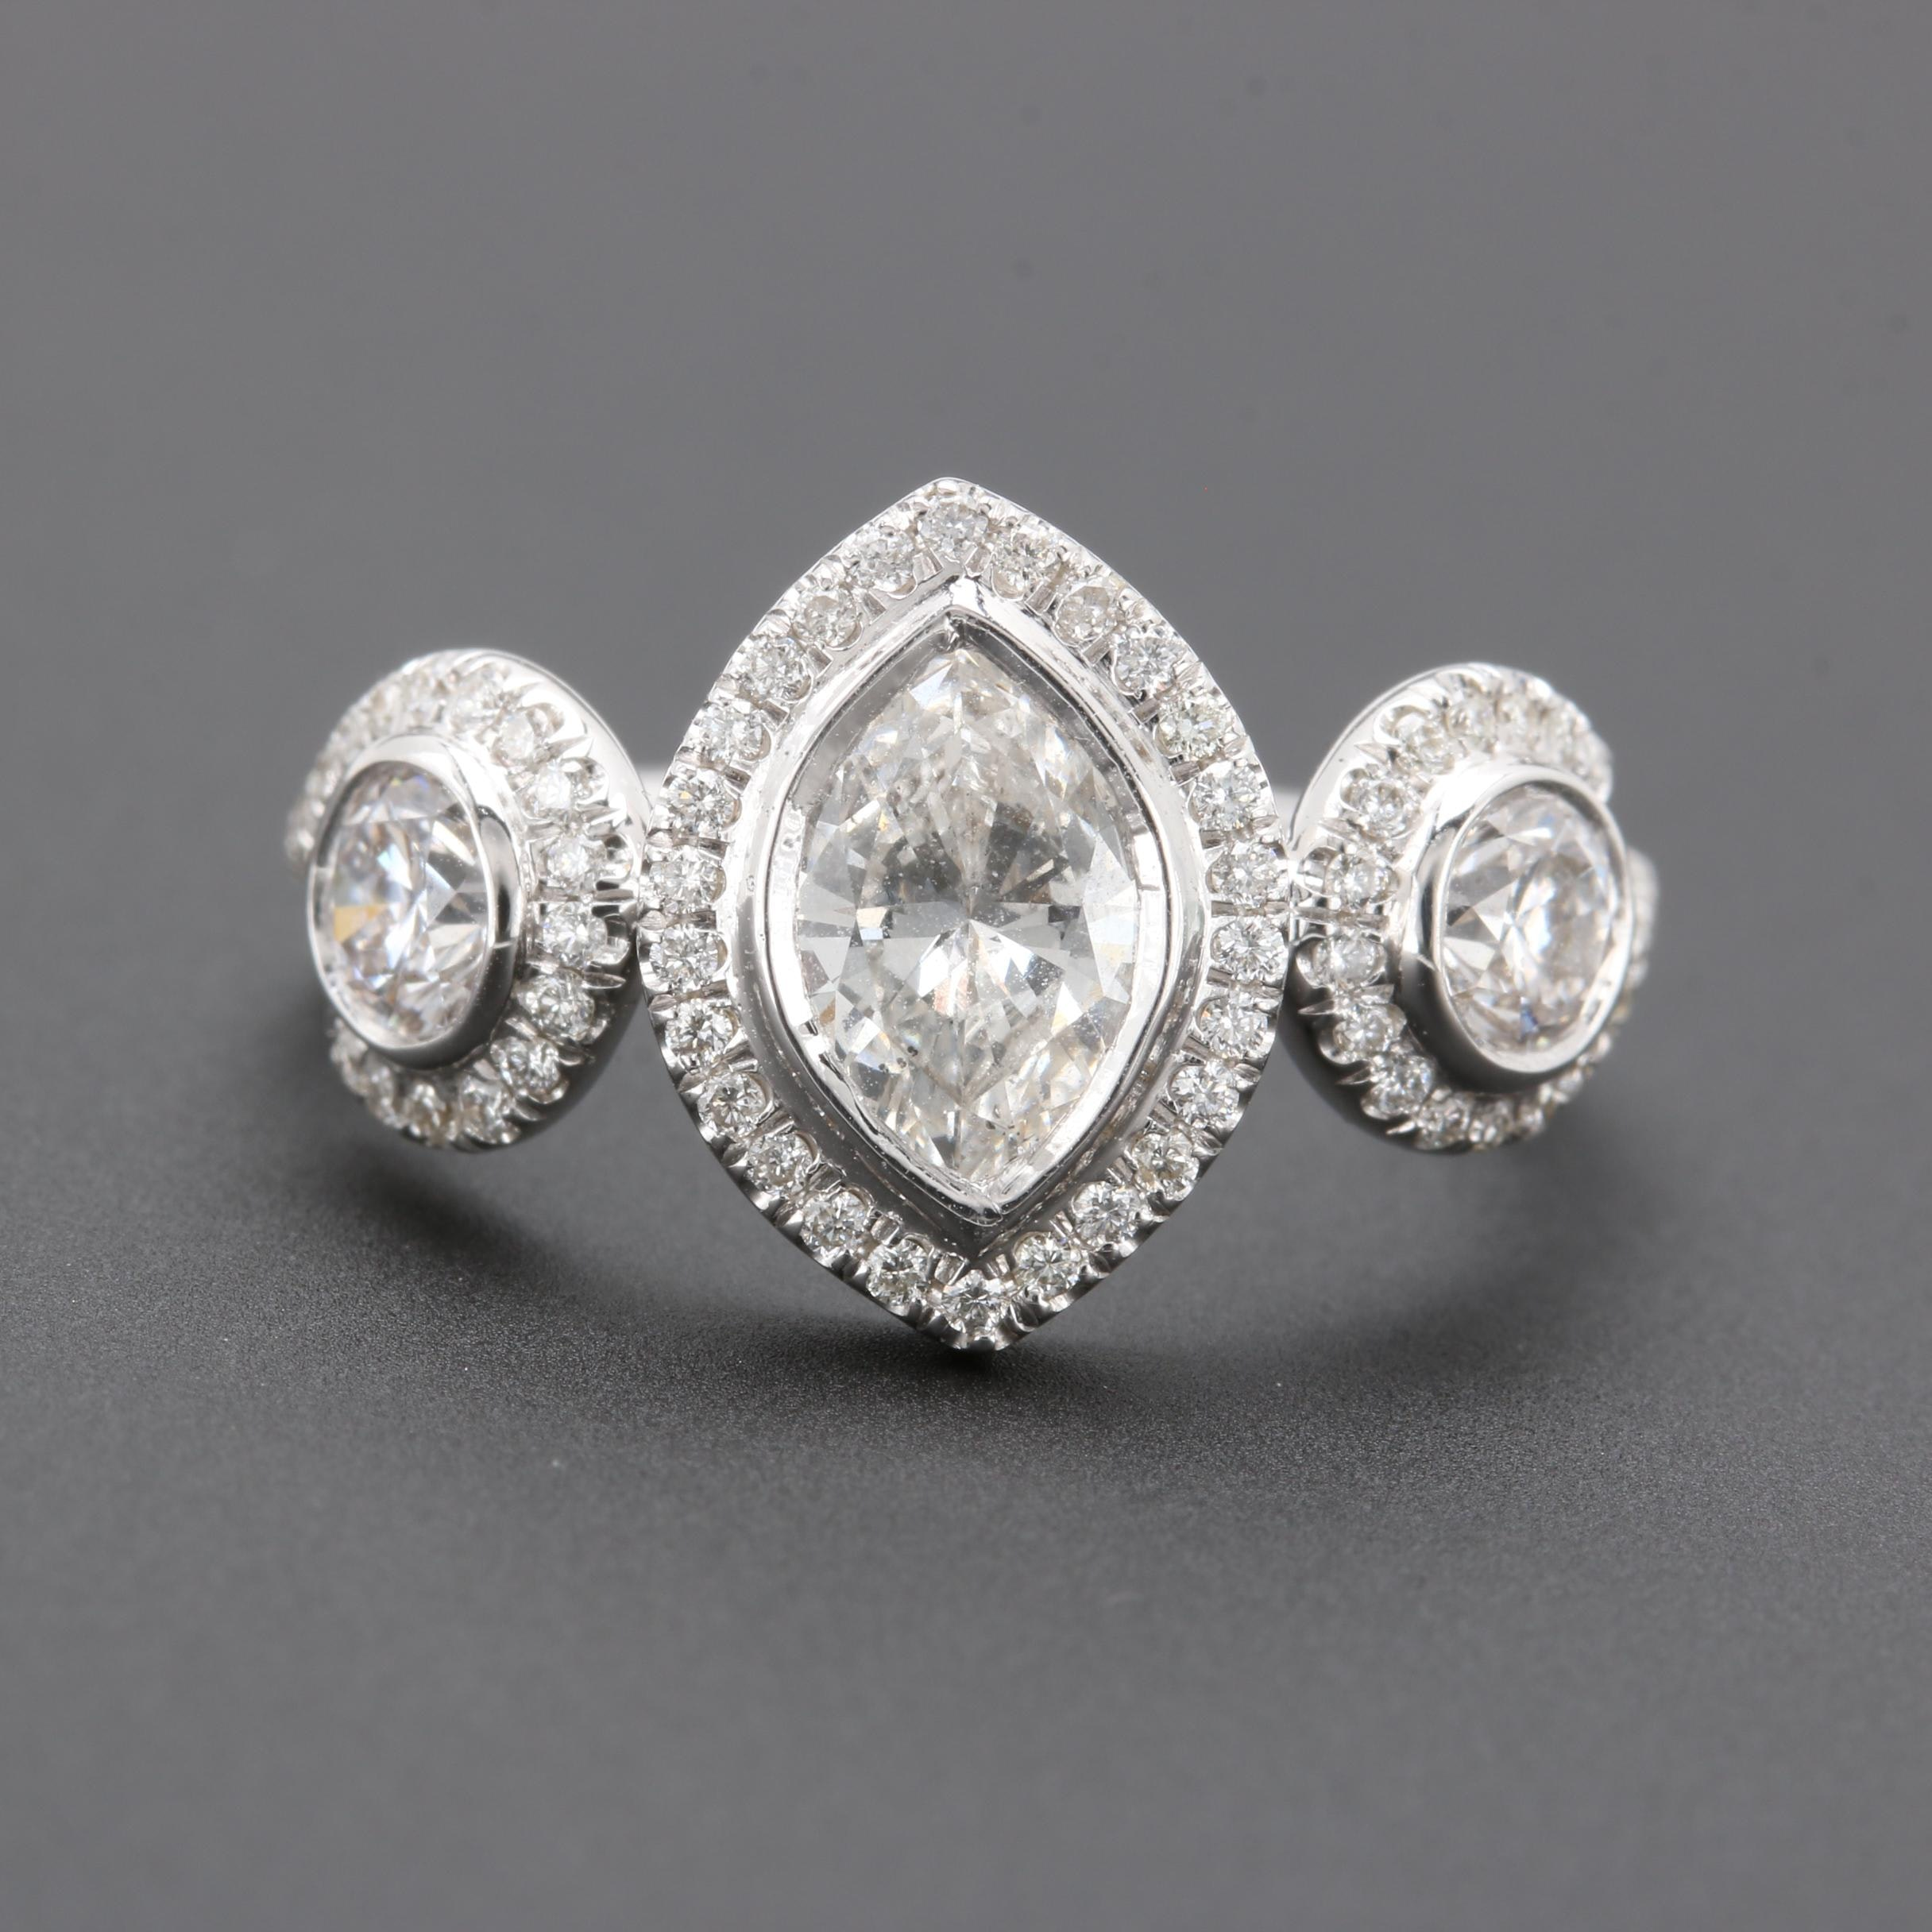 18K White Gold 1.46 CTW Diamond Ring